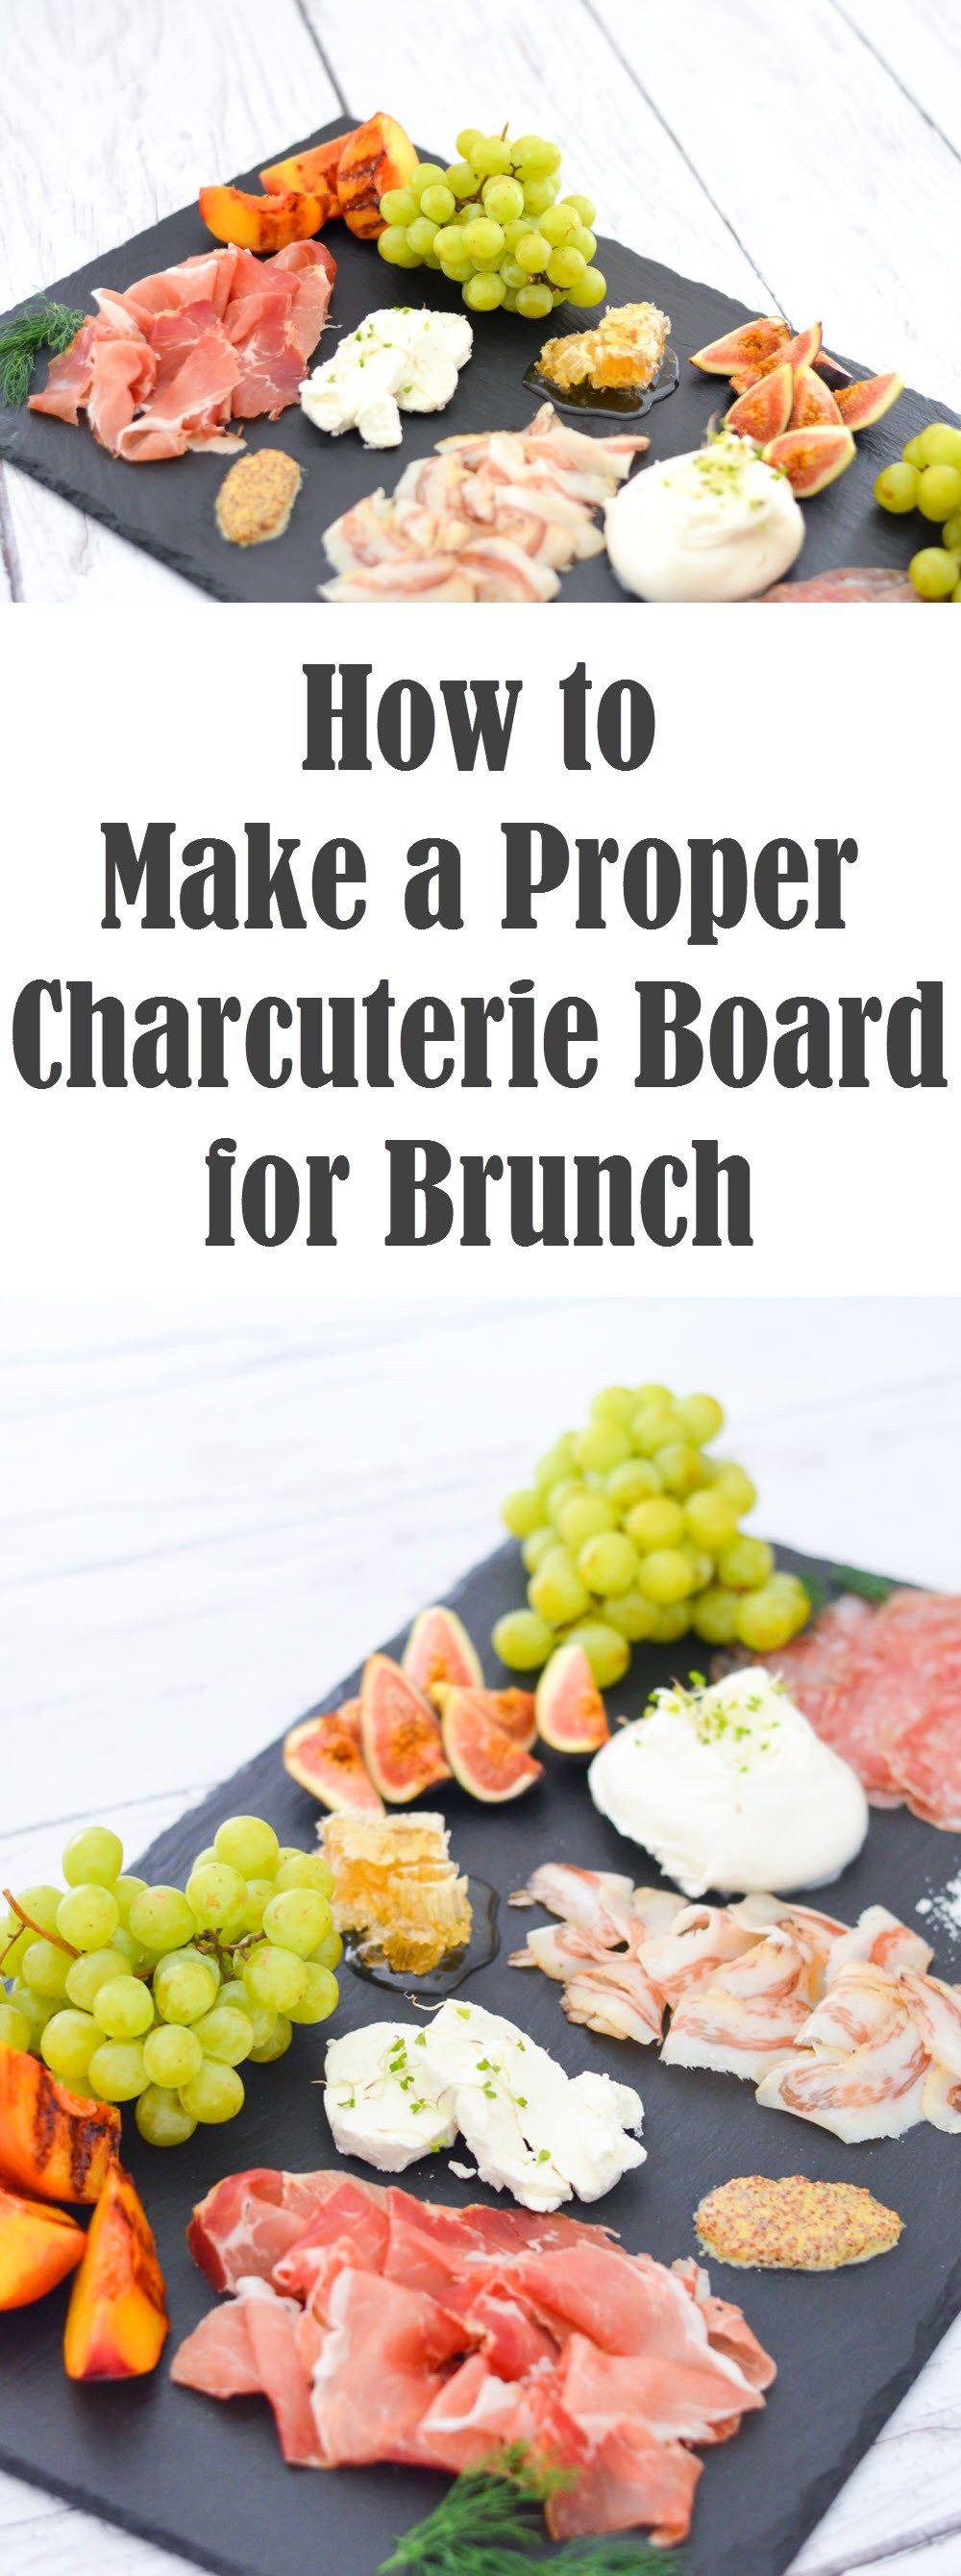 Brunch Charcuterie Board | Ideas- hosting guests! | Pinterest ...